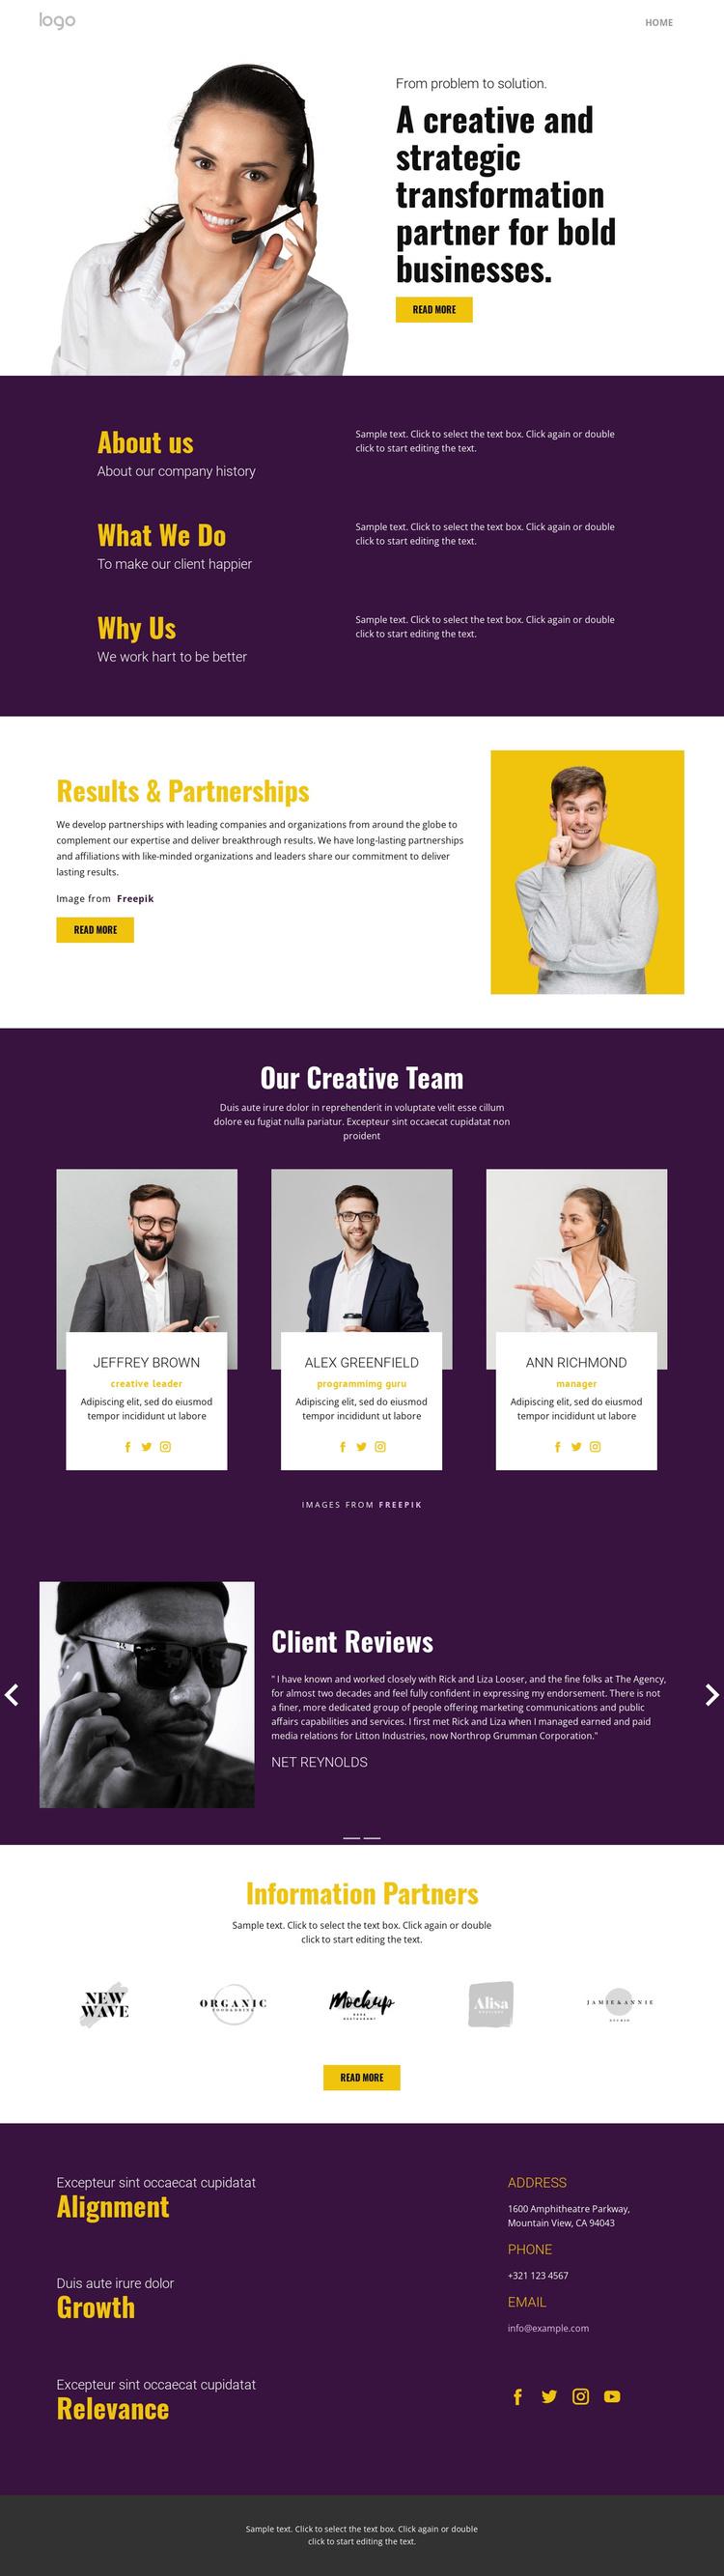 Creative strategy in business Joomla Template